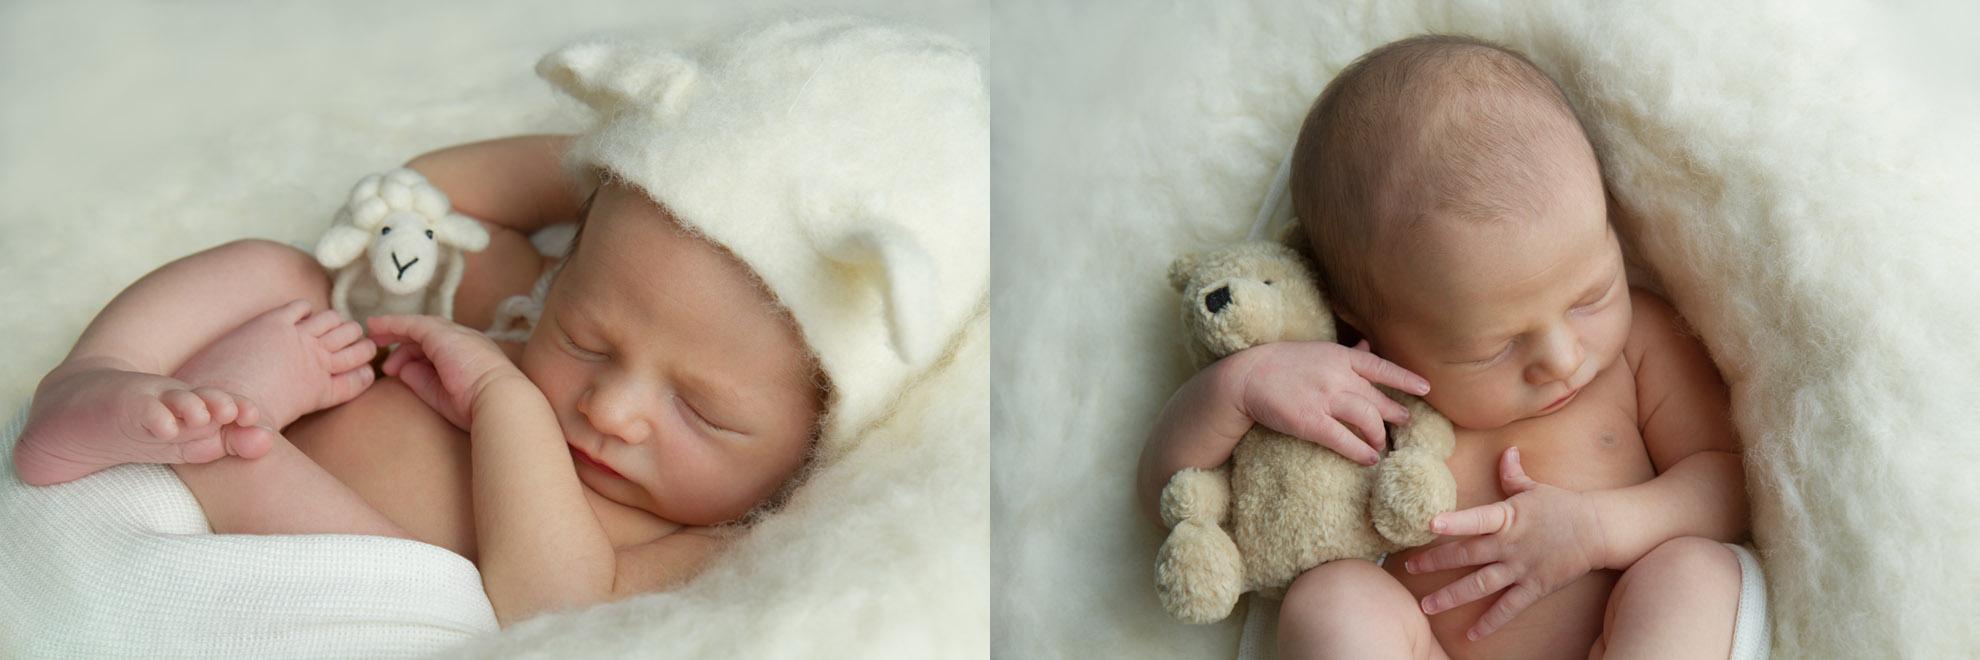 Hamilton-baby-photographer-newborn-with-lamb-and-teddy-bear.jpg